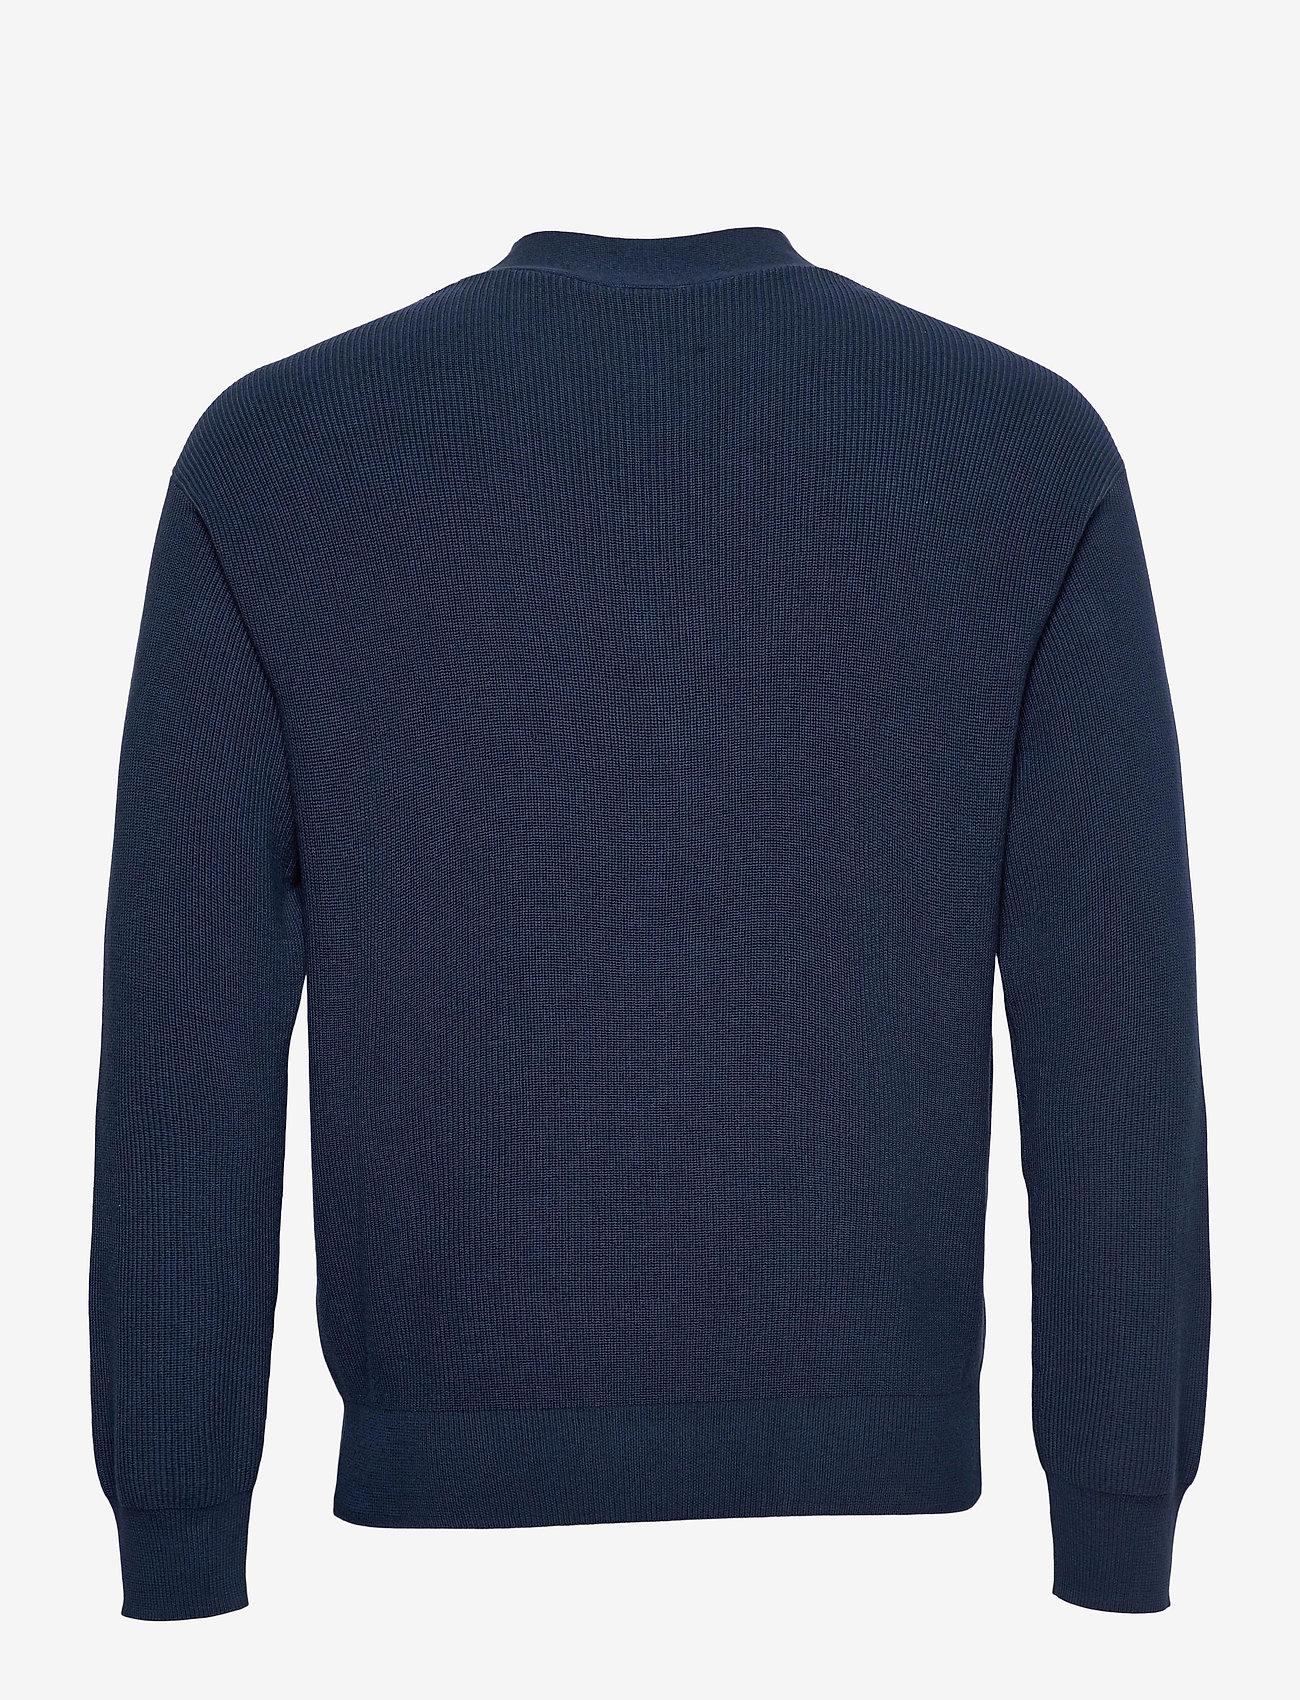 BOSS - Kardione - tricots basiques - dark blue - 1